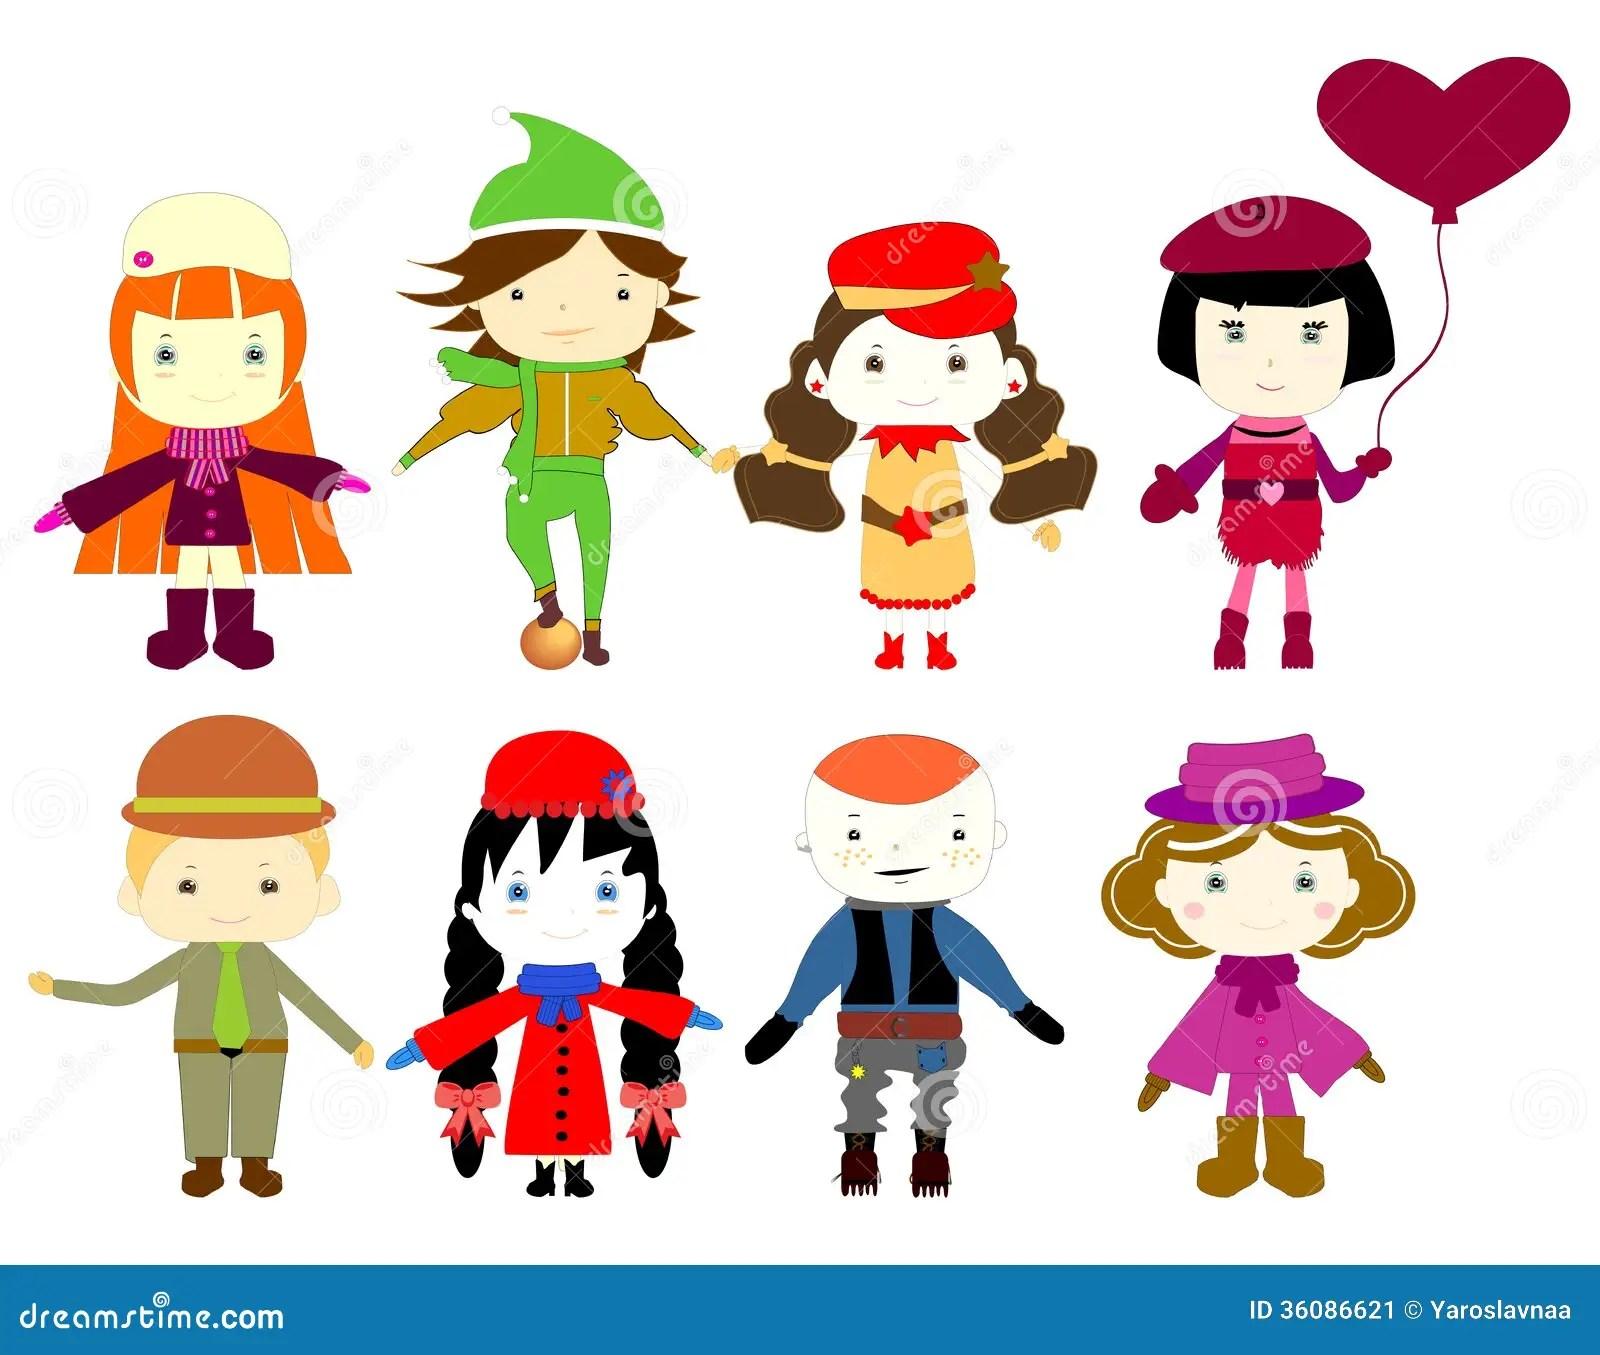 Cartoon Drawings Of Children Stock Image